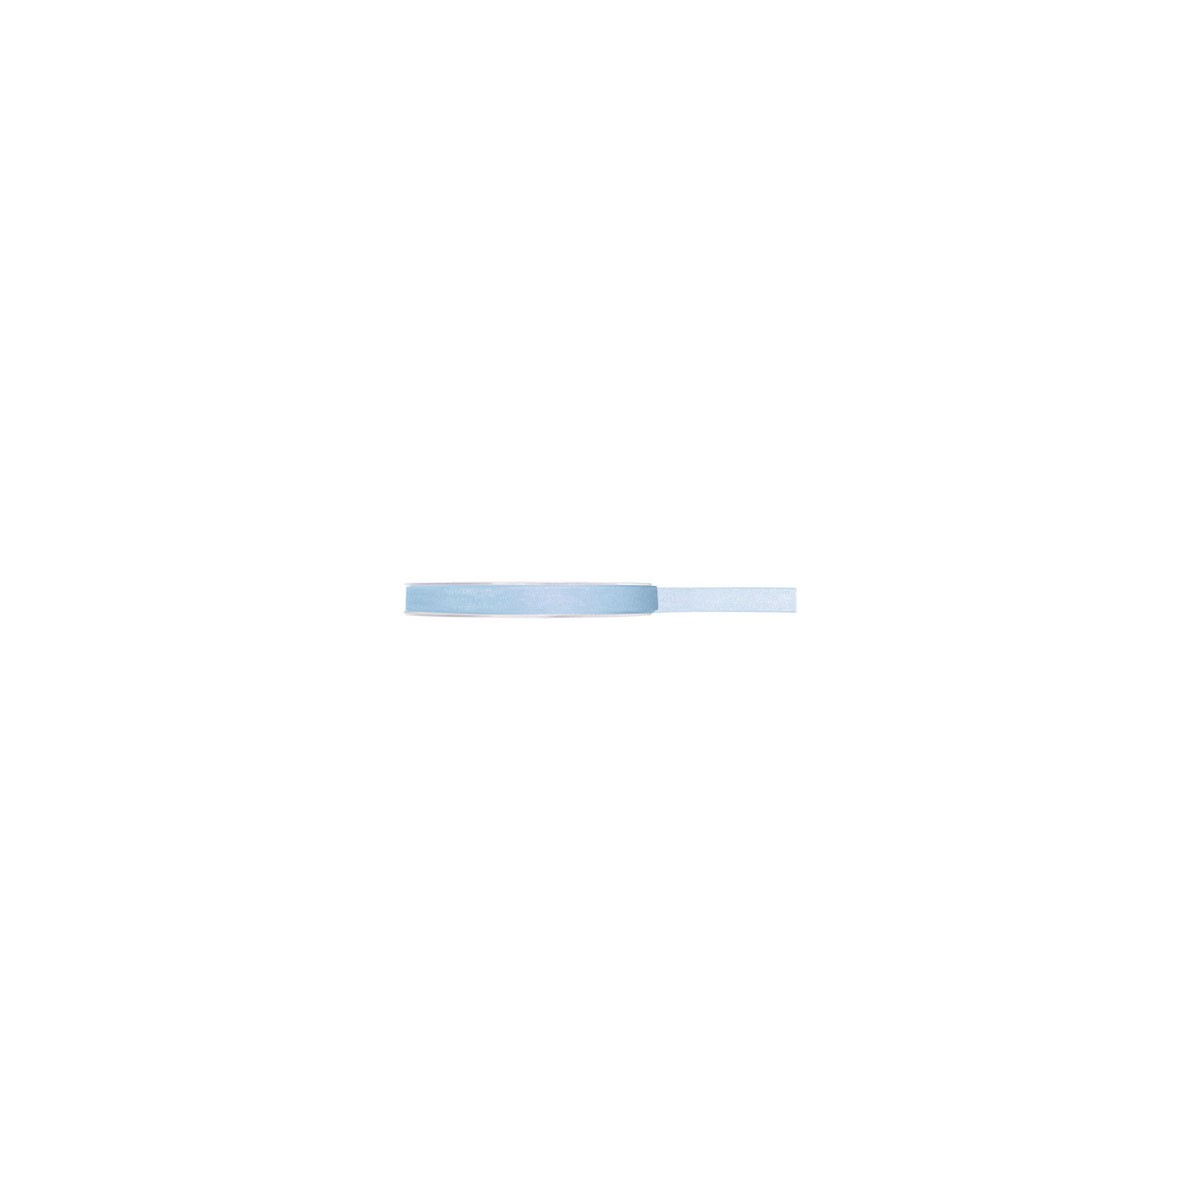 Ruban Organdi Bleu Ciel - 7 mm